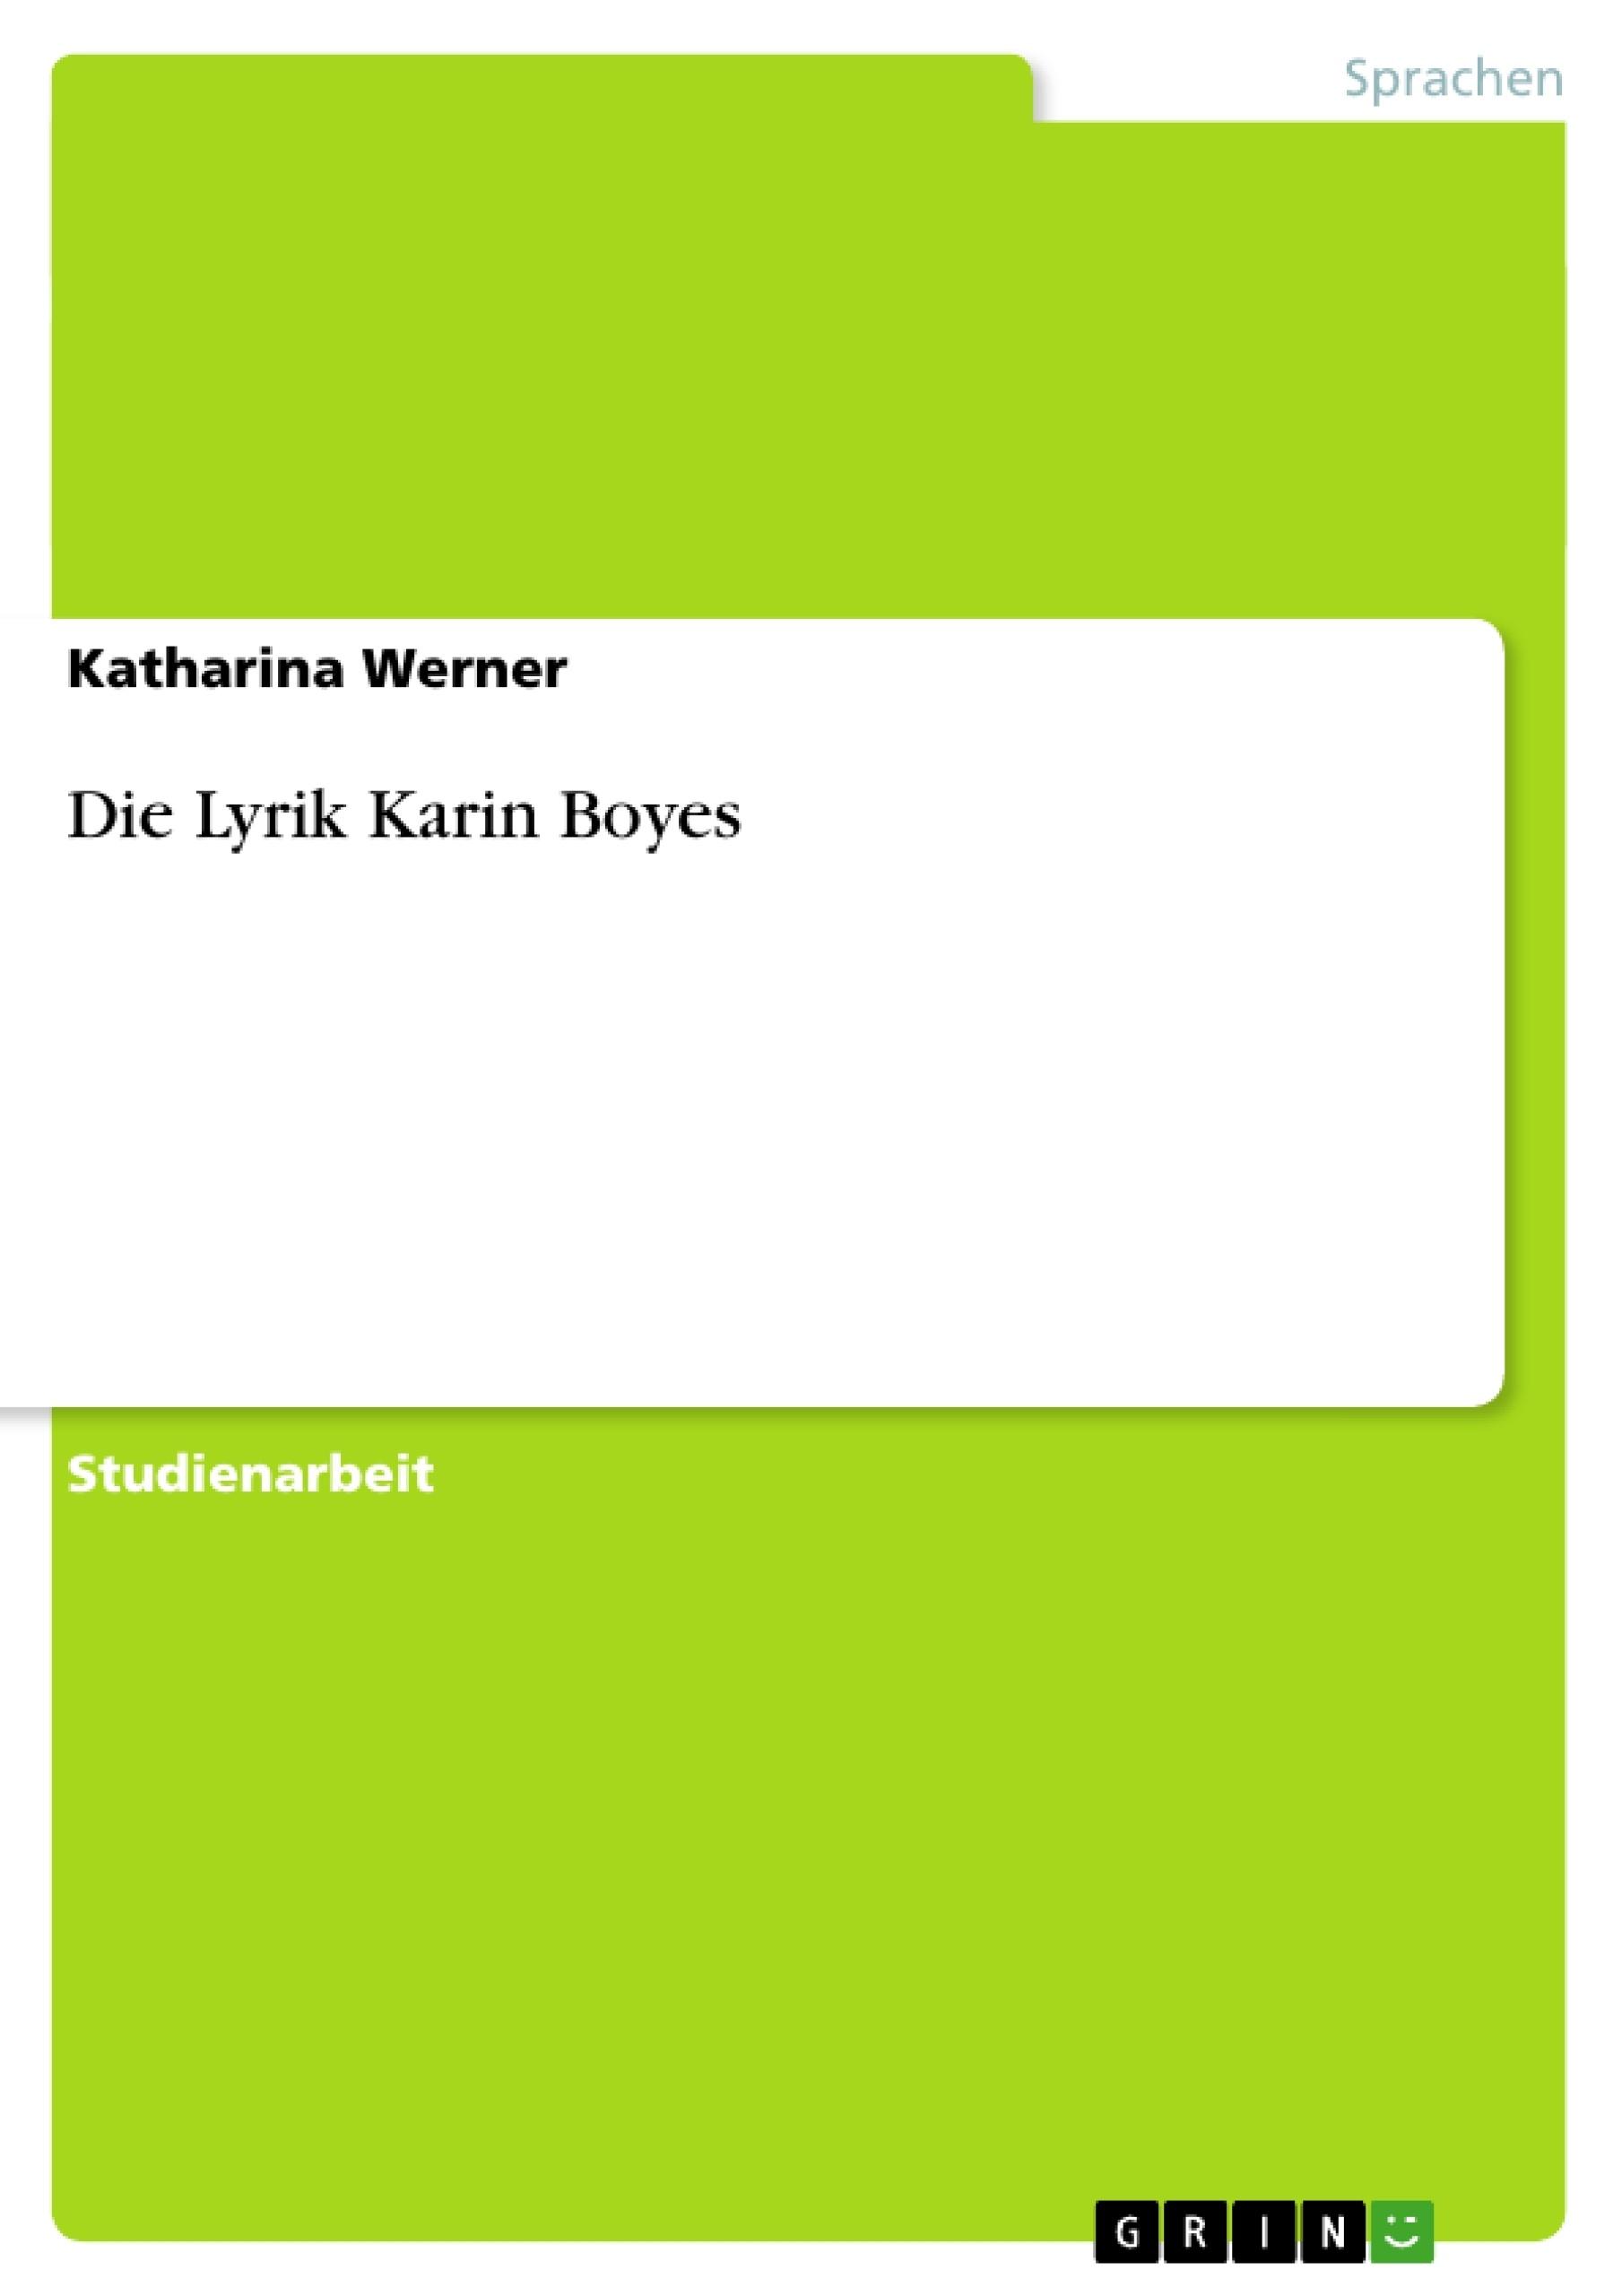 Titel: Die Lyrik Karin Boyes